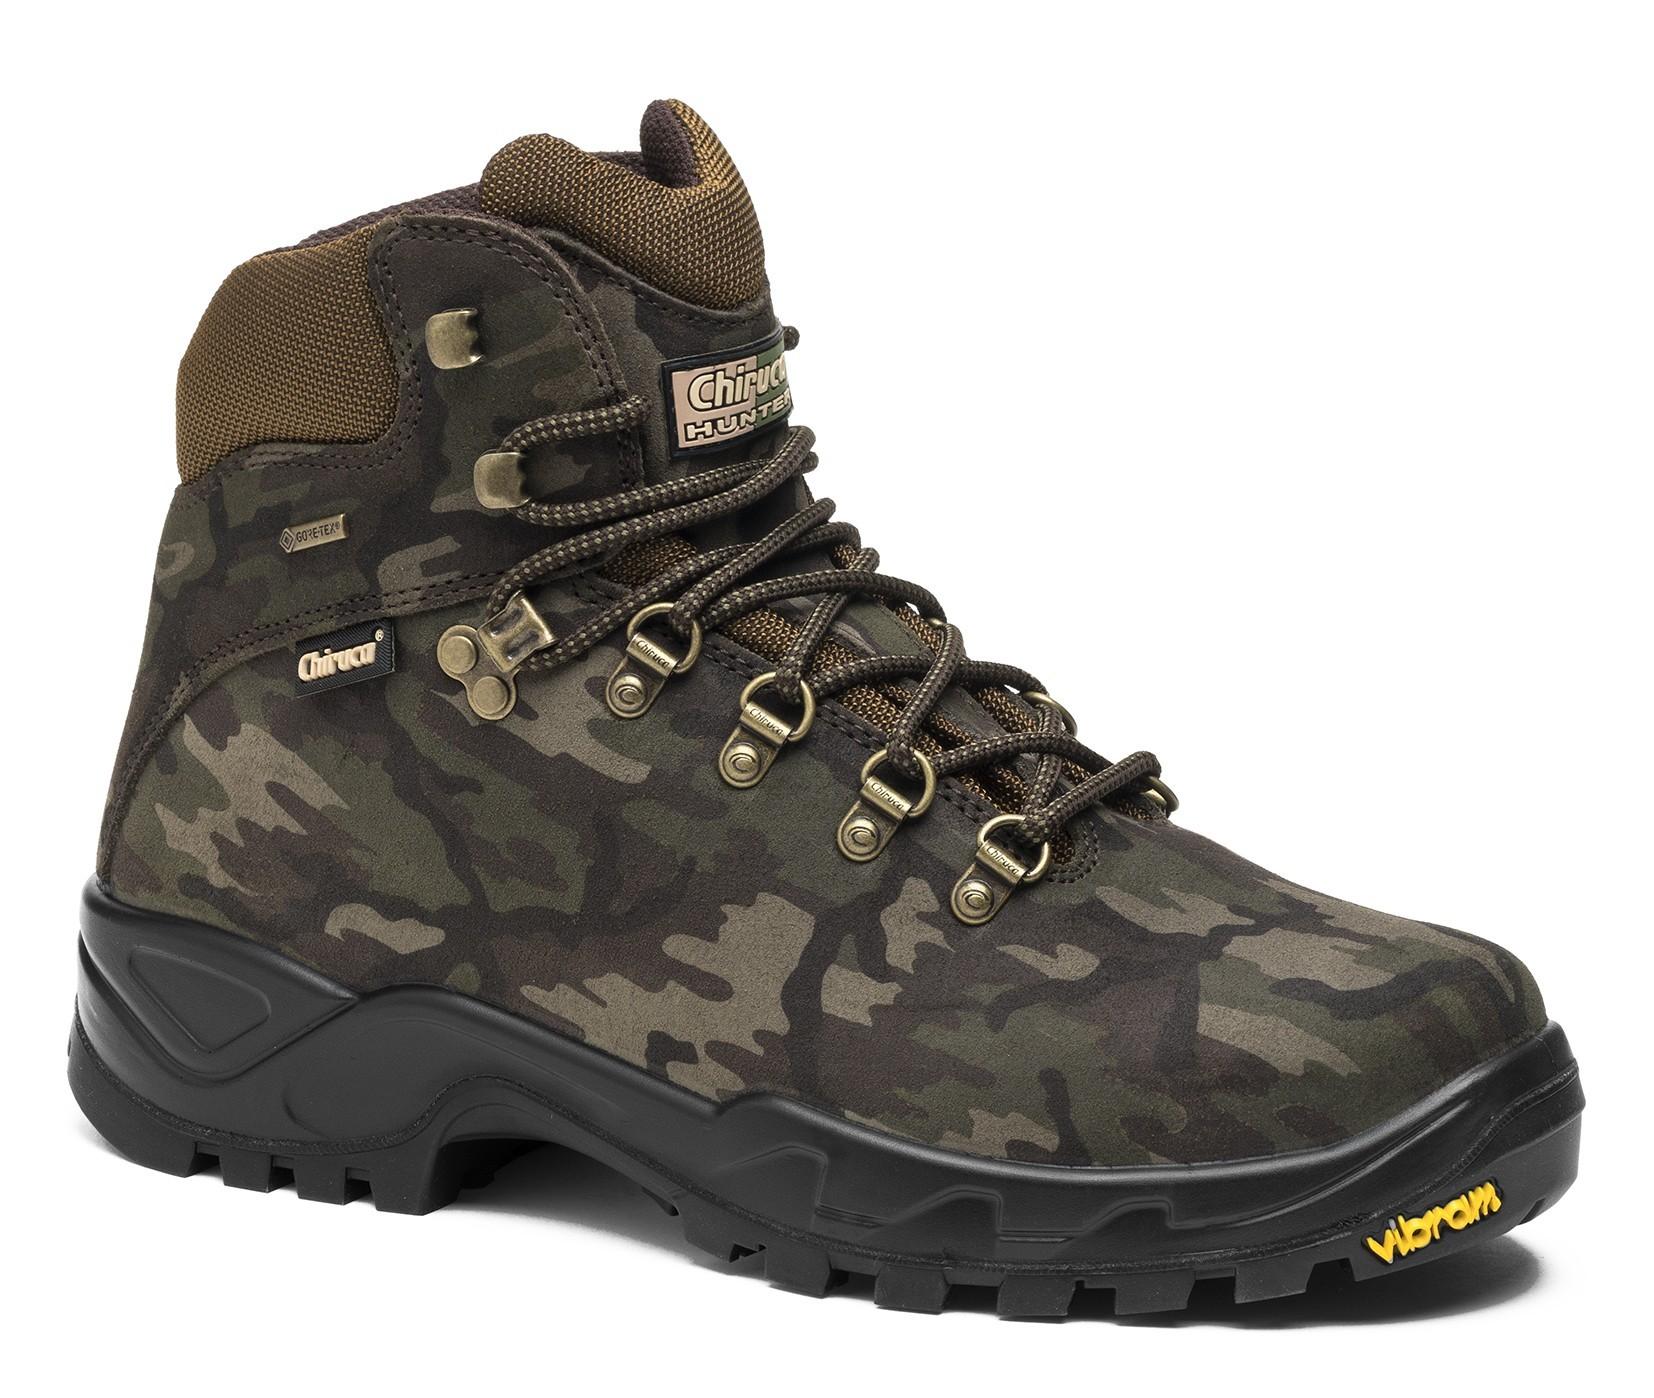 6b270db1 Ботинки Chiruca Camo 21 Gore-Tex (44270 21)   ORDVOR.COM